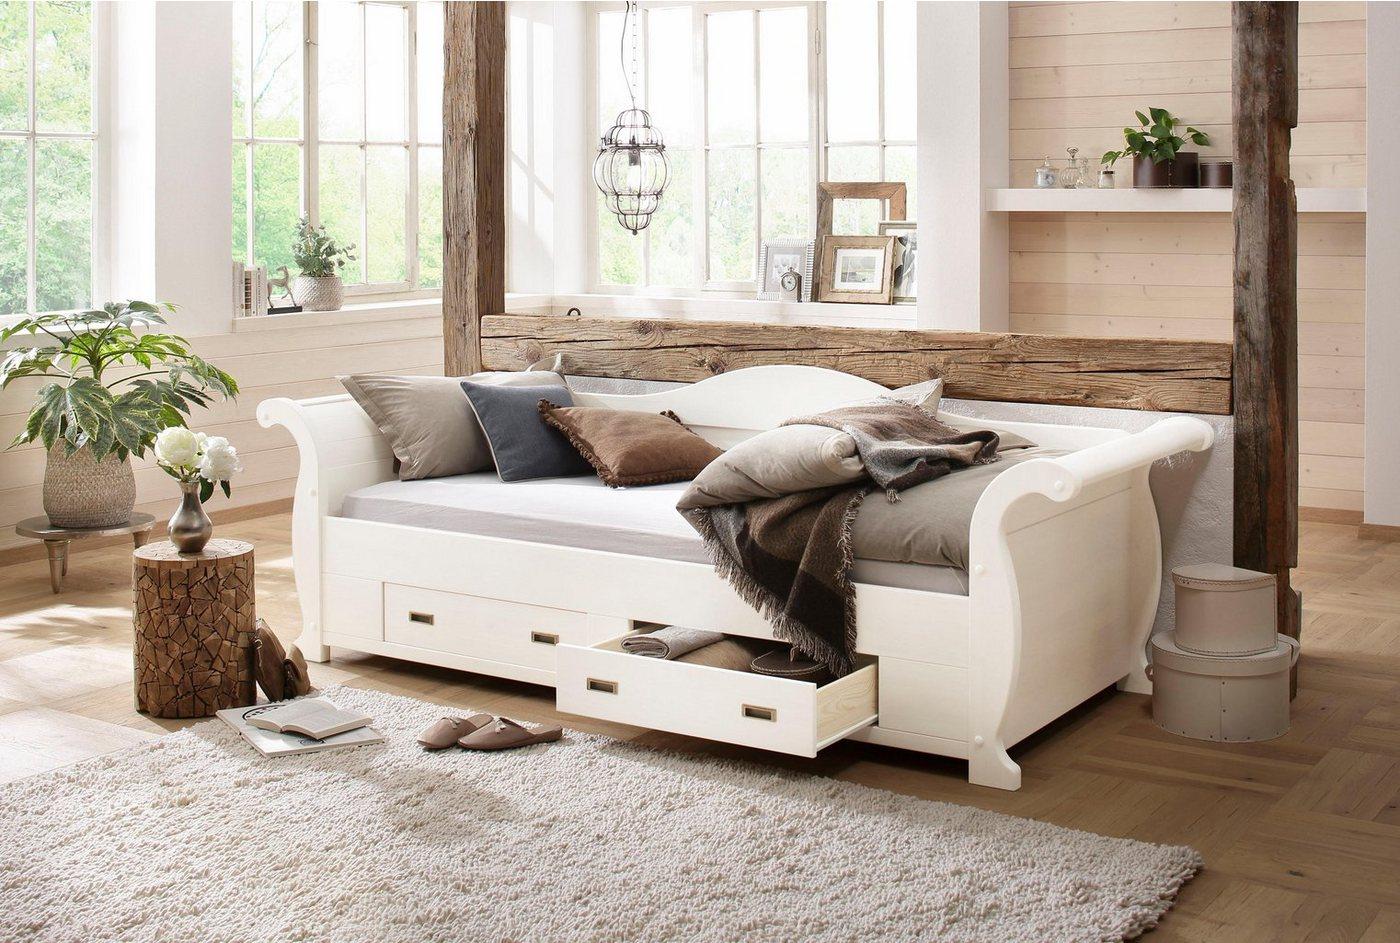 HOME AFFAIRE ledikant met bergruimte Bella, met decoratief freeswerk, ligoppervlak: 90x200 cm